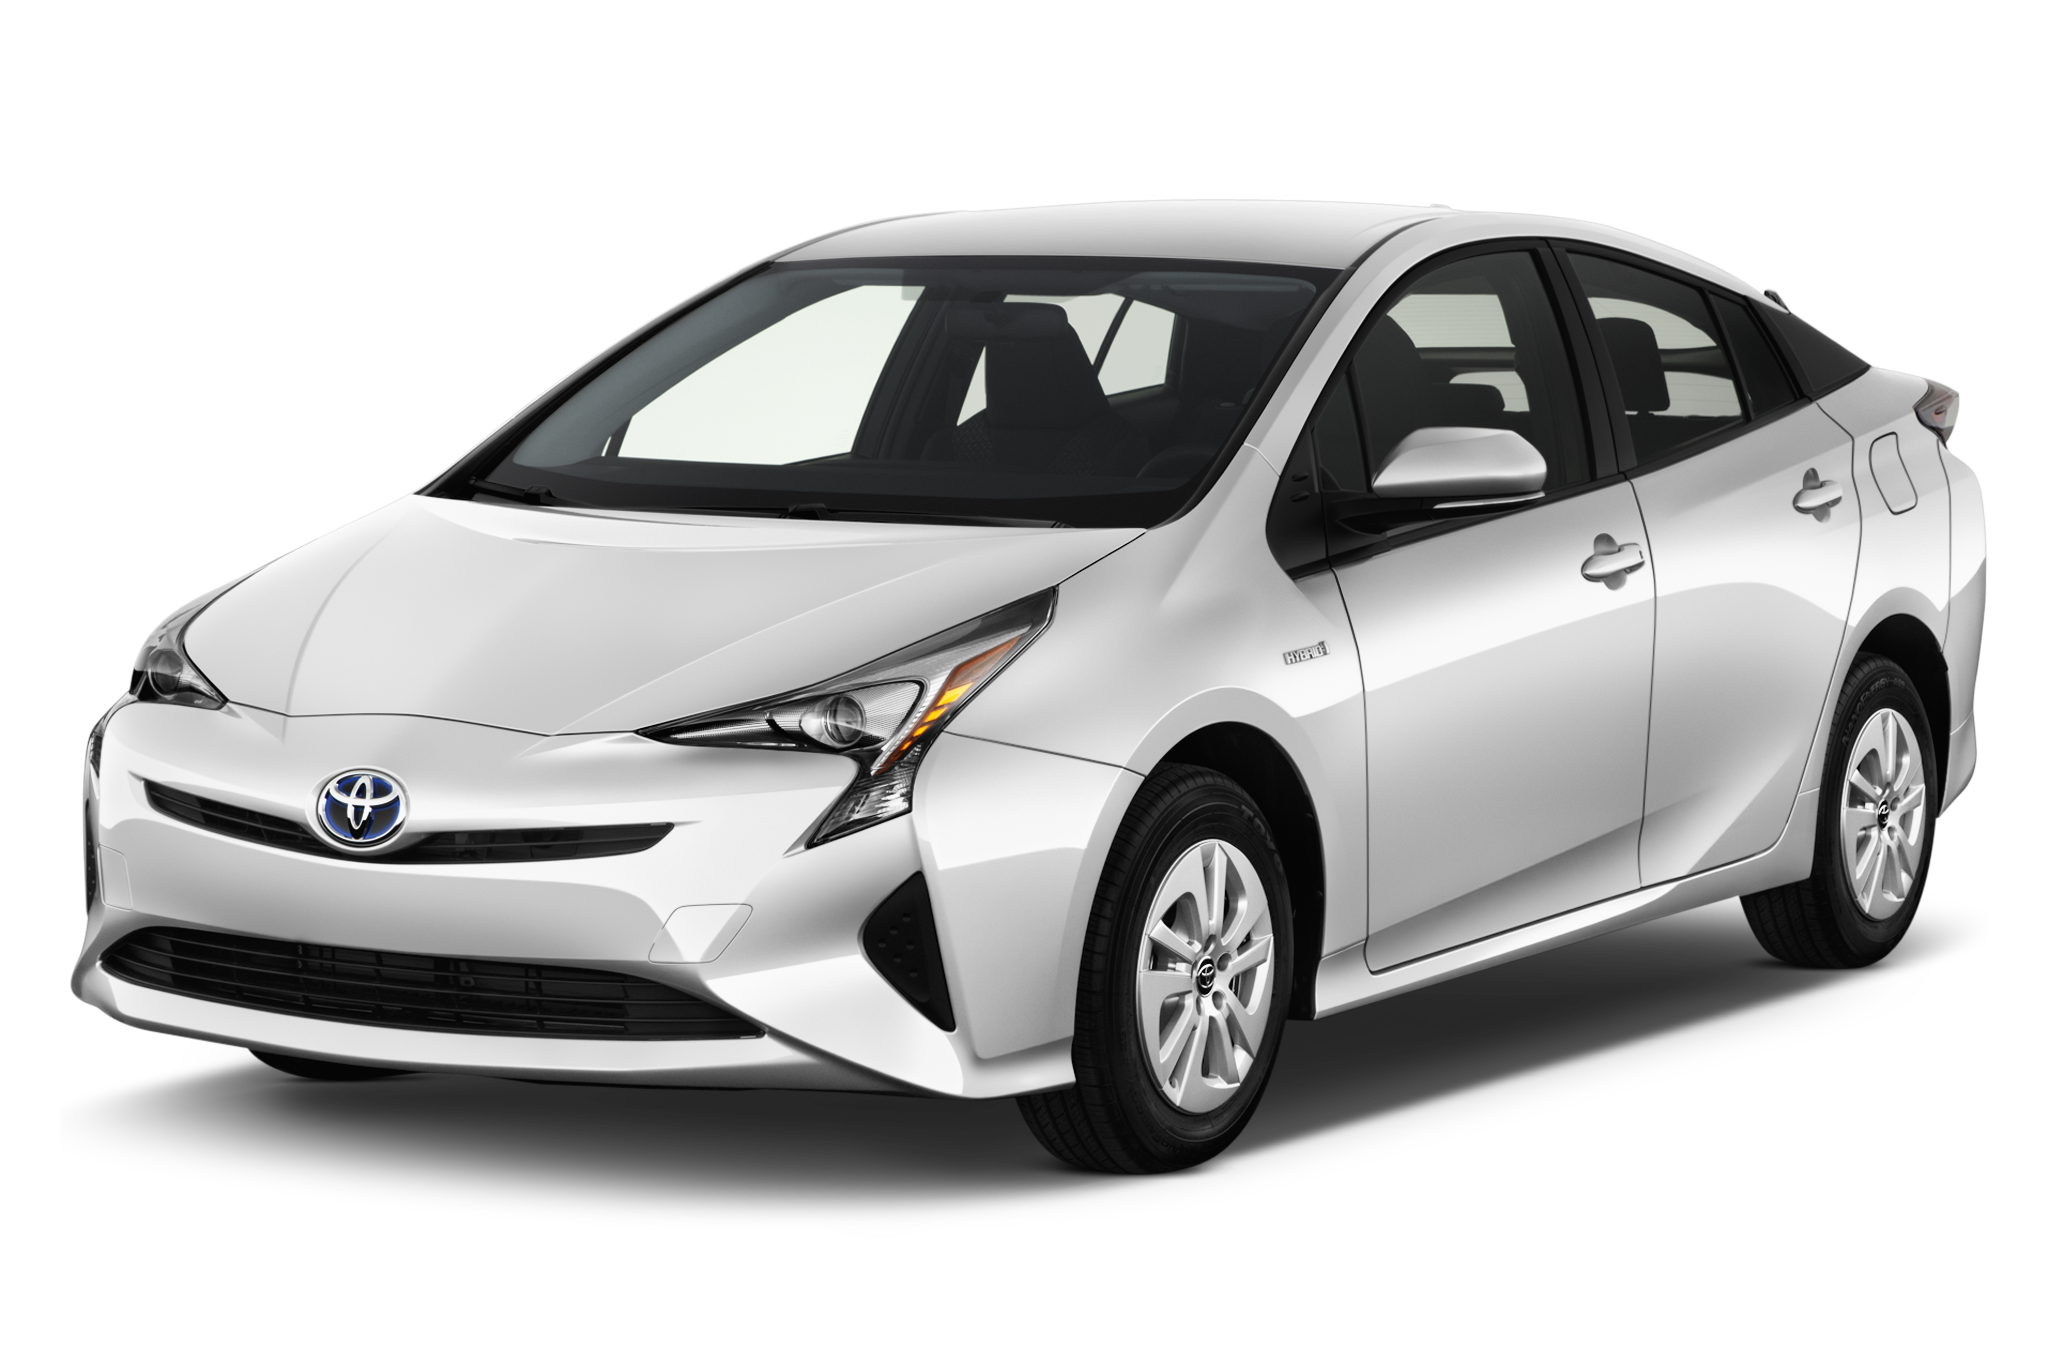 Hybrid Car Png - Hybrid Car Png Clipart, Transparent background PNG HD thumbnail